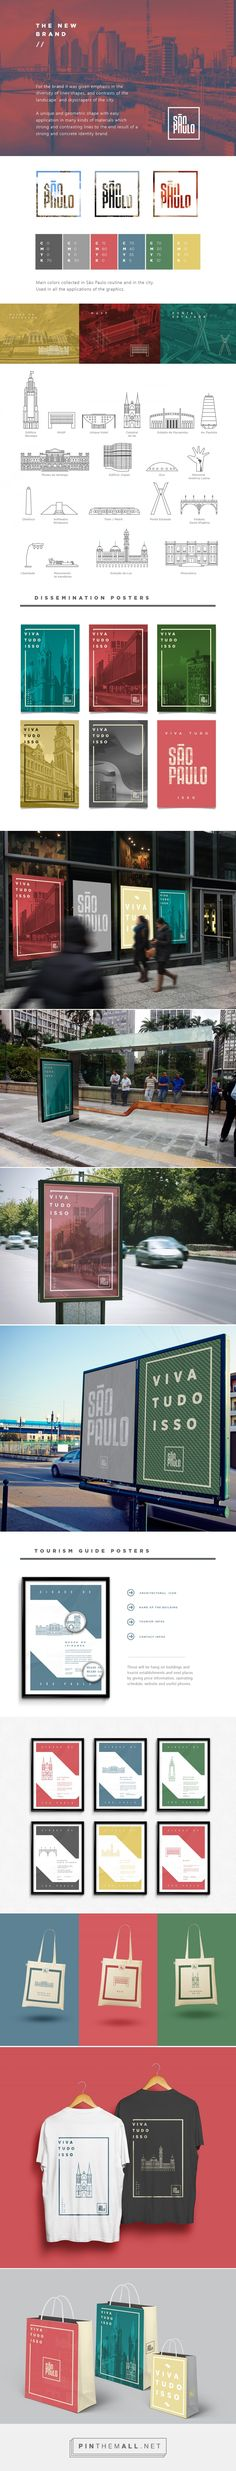 São Paulo City | Rebrand Propose by Haran Amorim